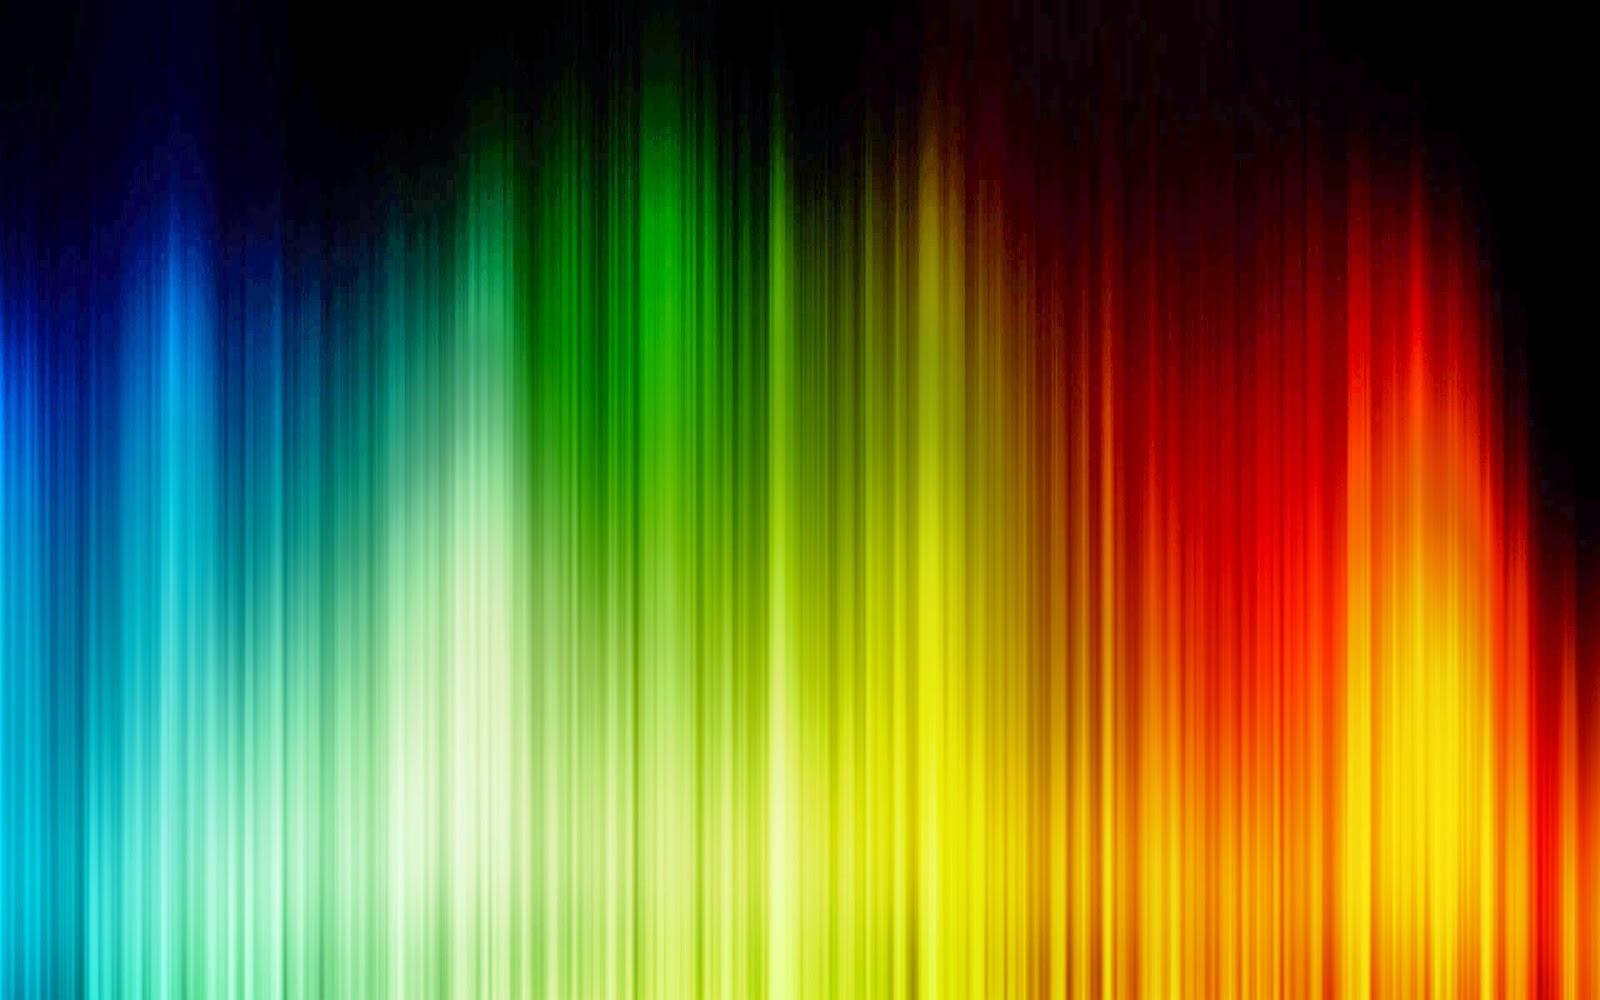 spectrum of light background - photo #24